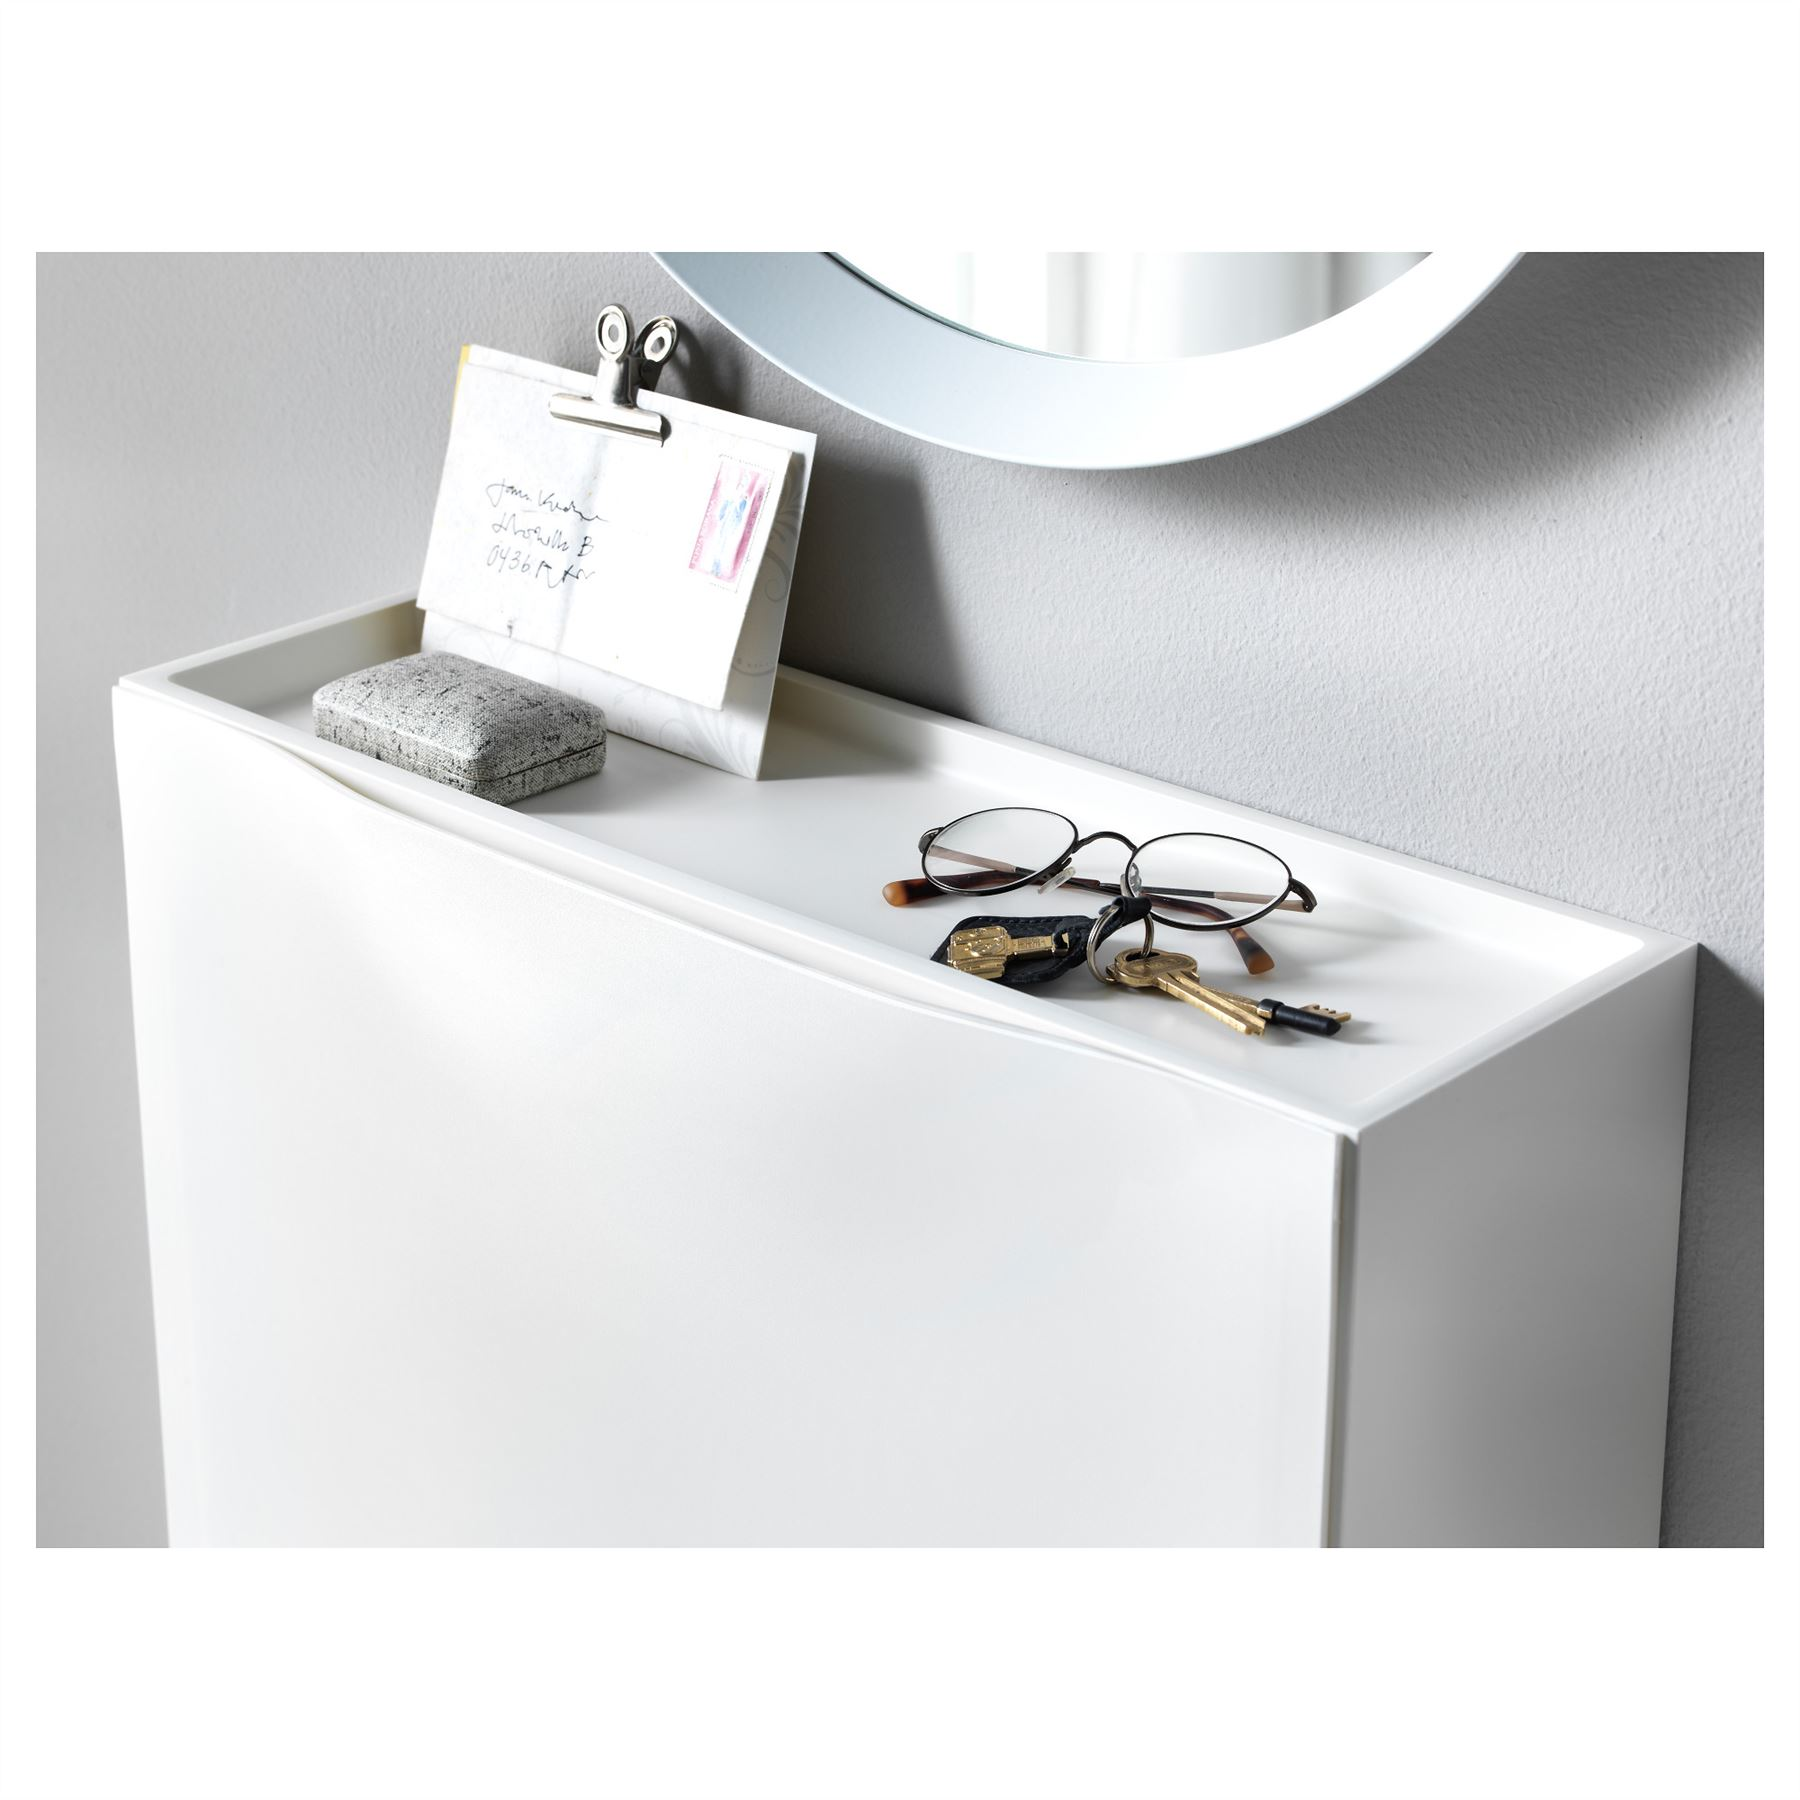 Ikea Trones Shoe Storage Cabinet 3 Pack White New | eBay